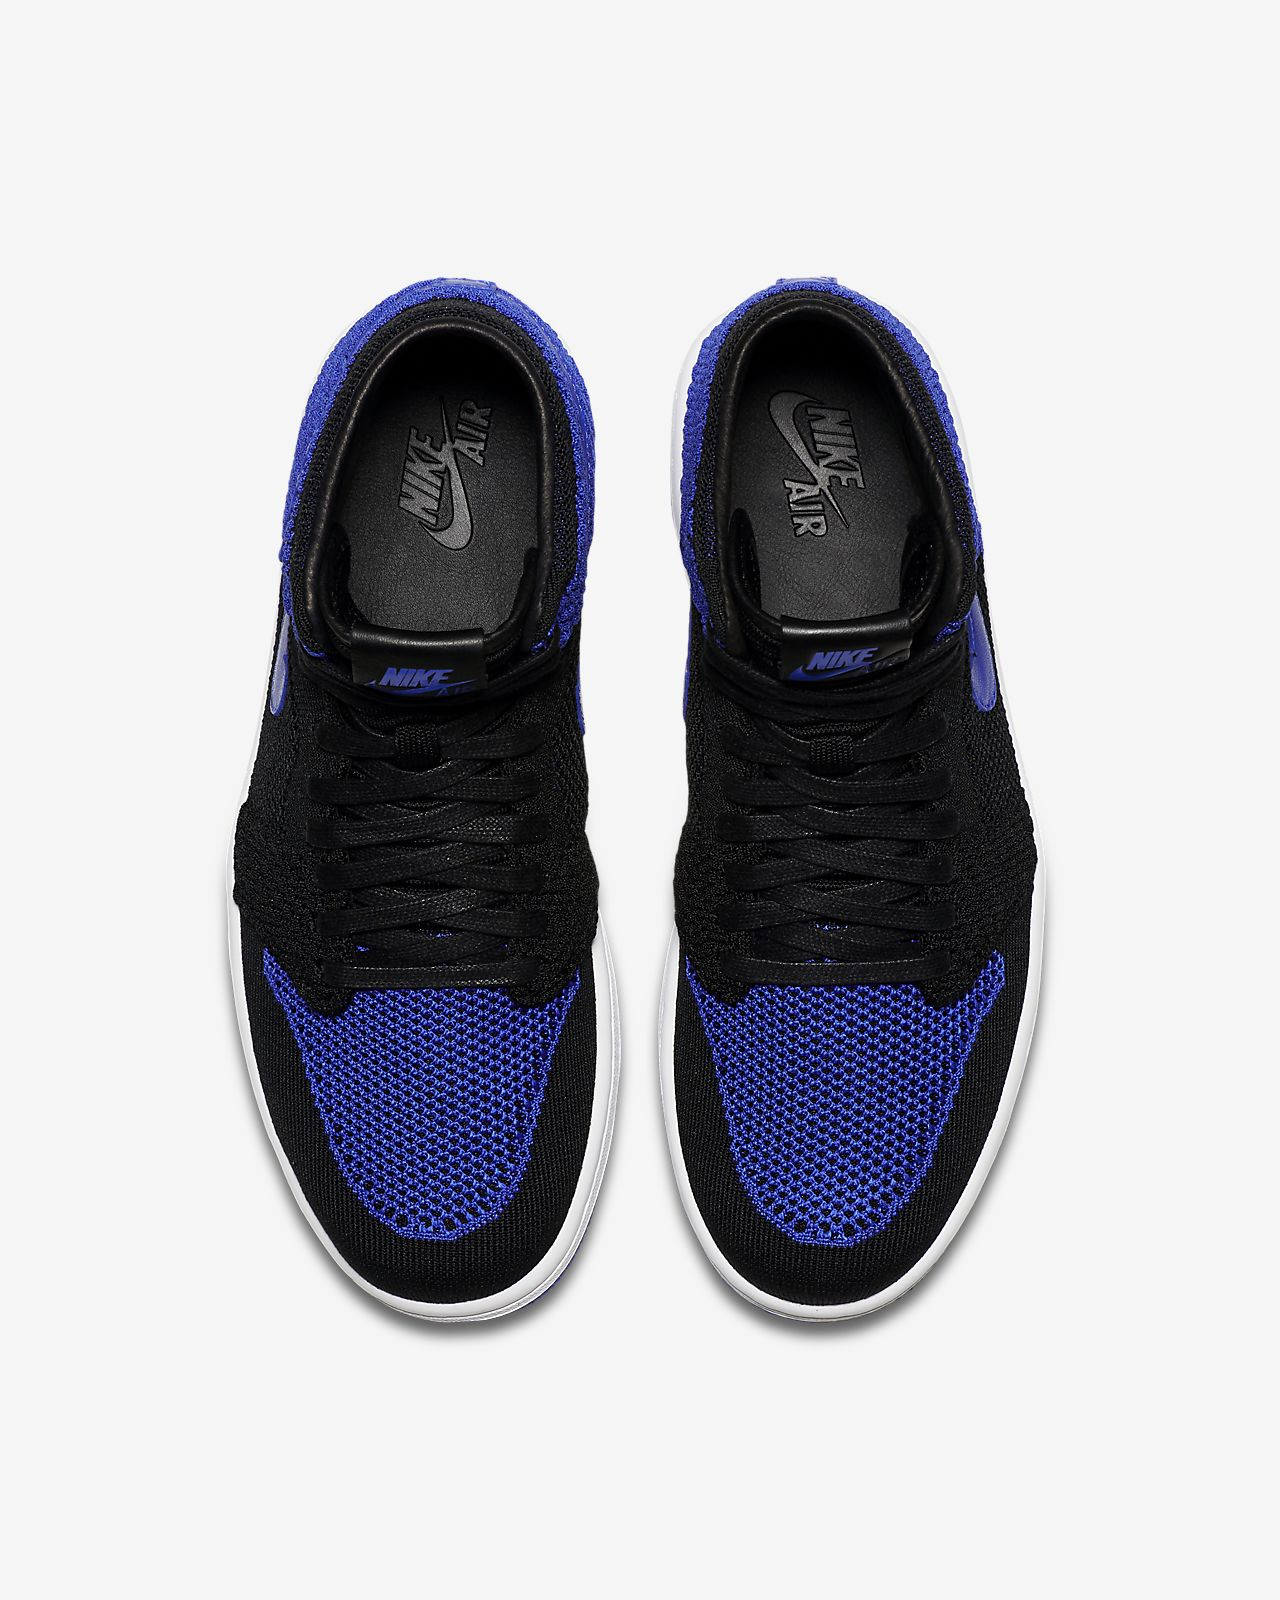 f2a0af39407 Air Jordan 1 Retro High Flyknit Men s Shoe. Nike.com IE